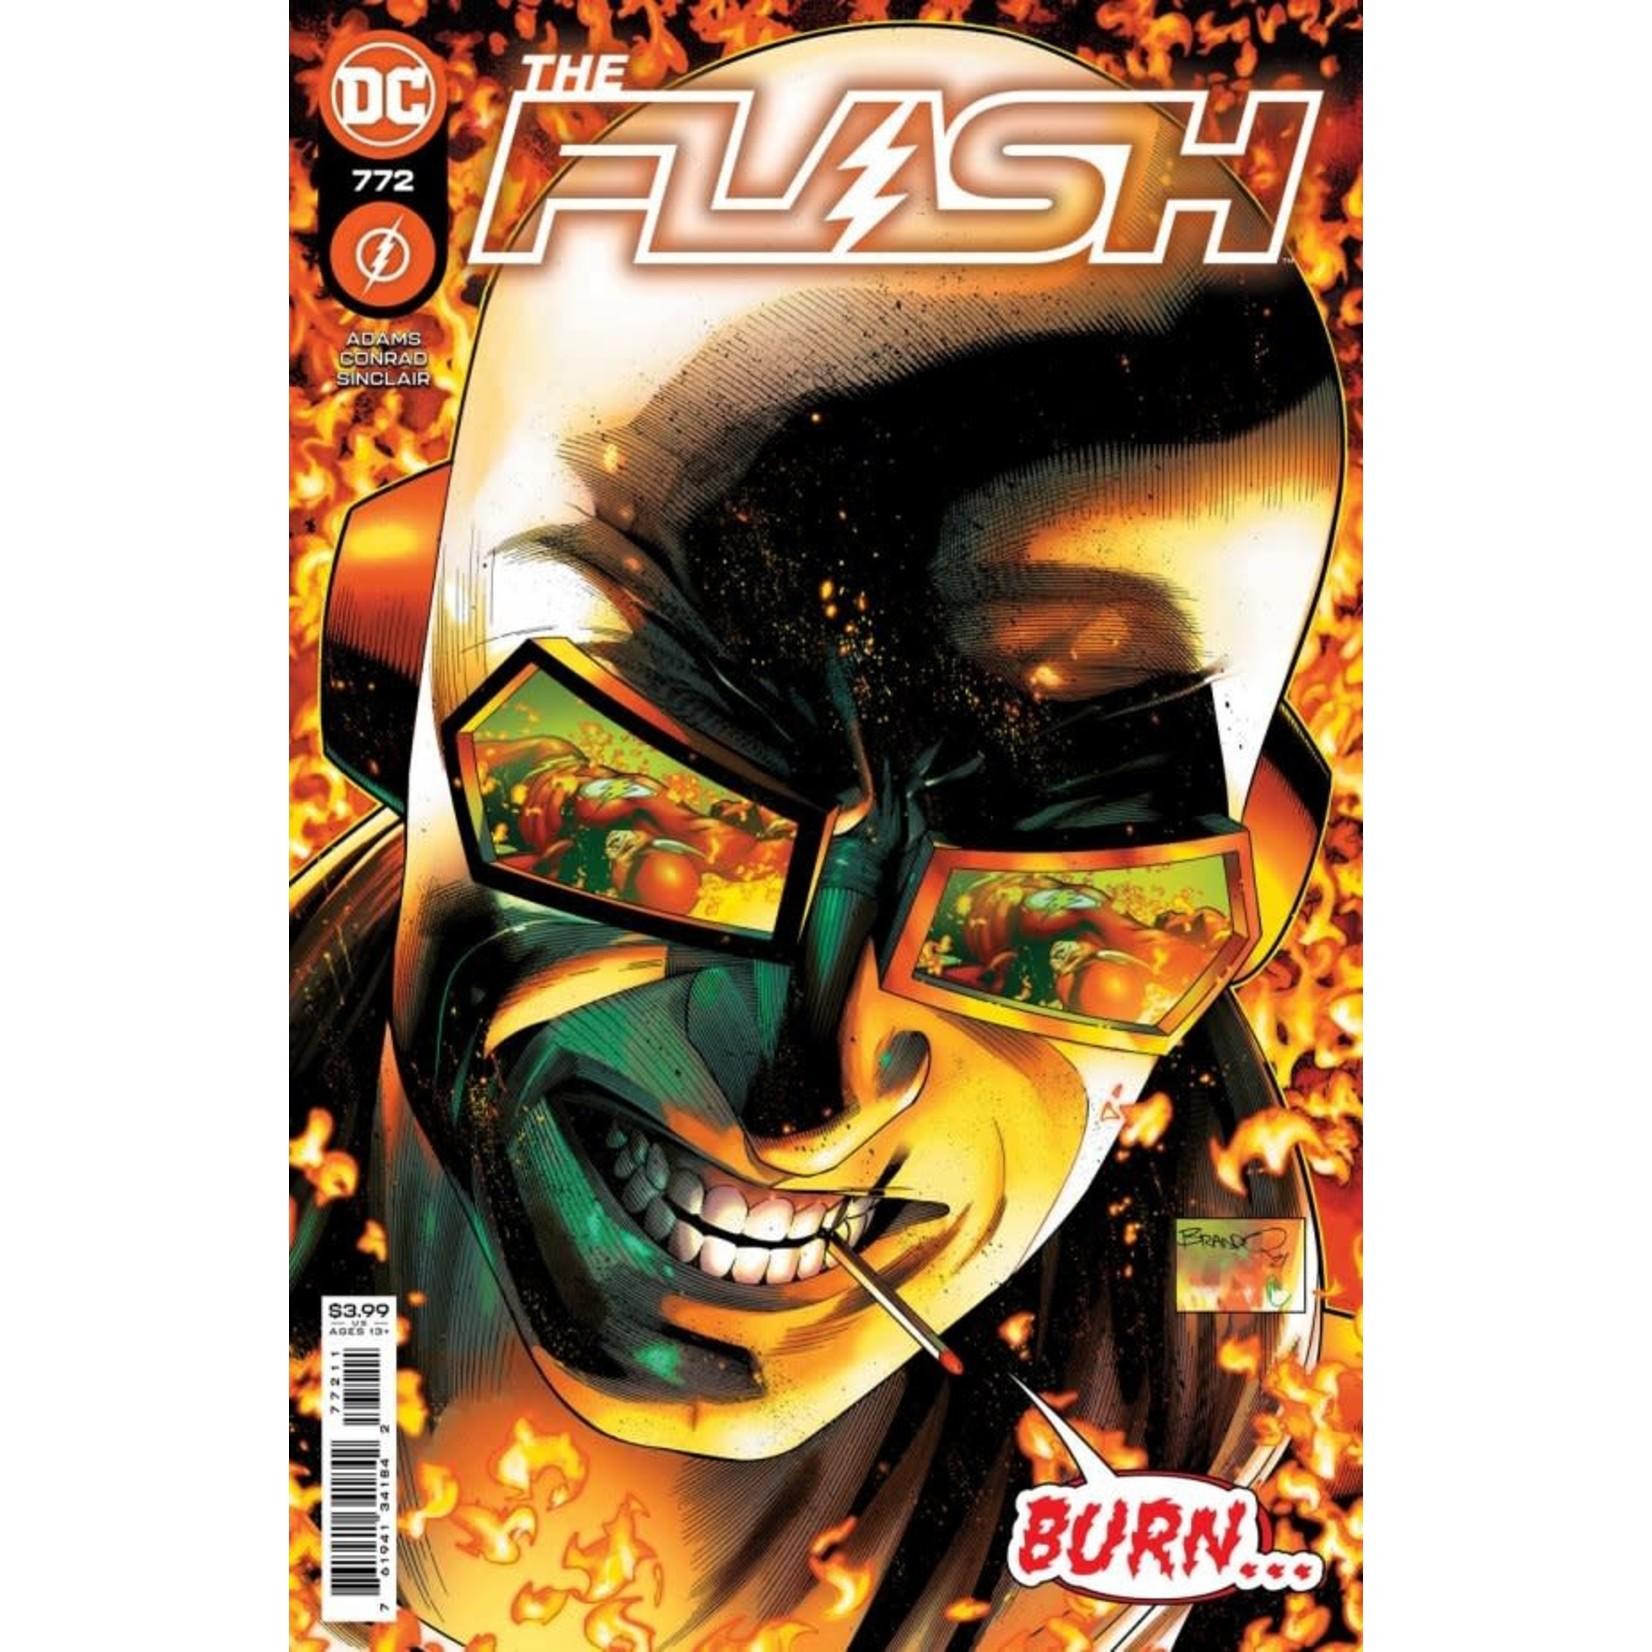 DC Comics The FLASH #772